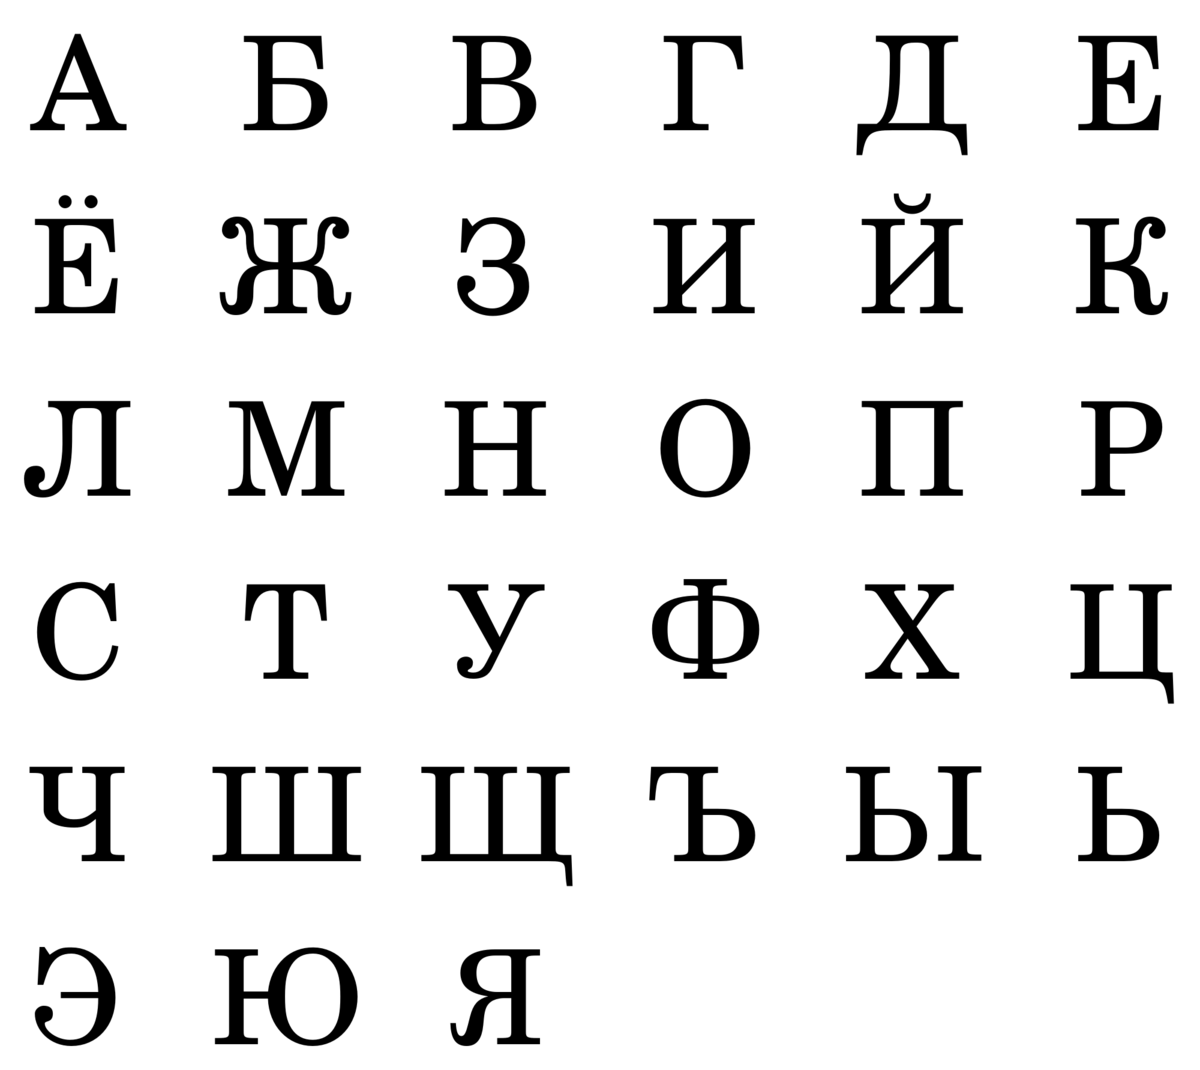 Картинка с алфавитом